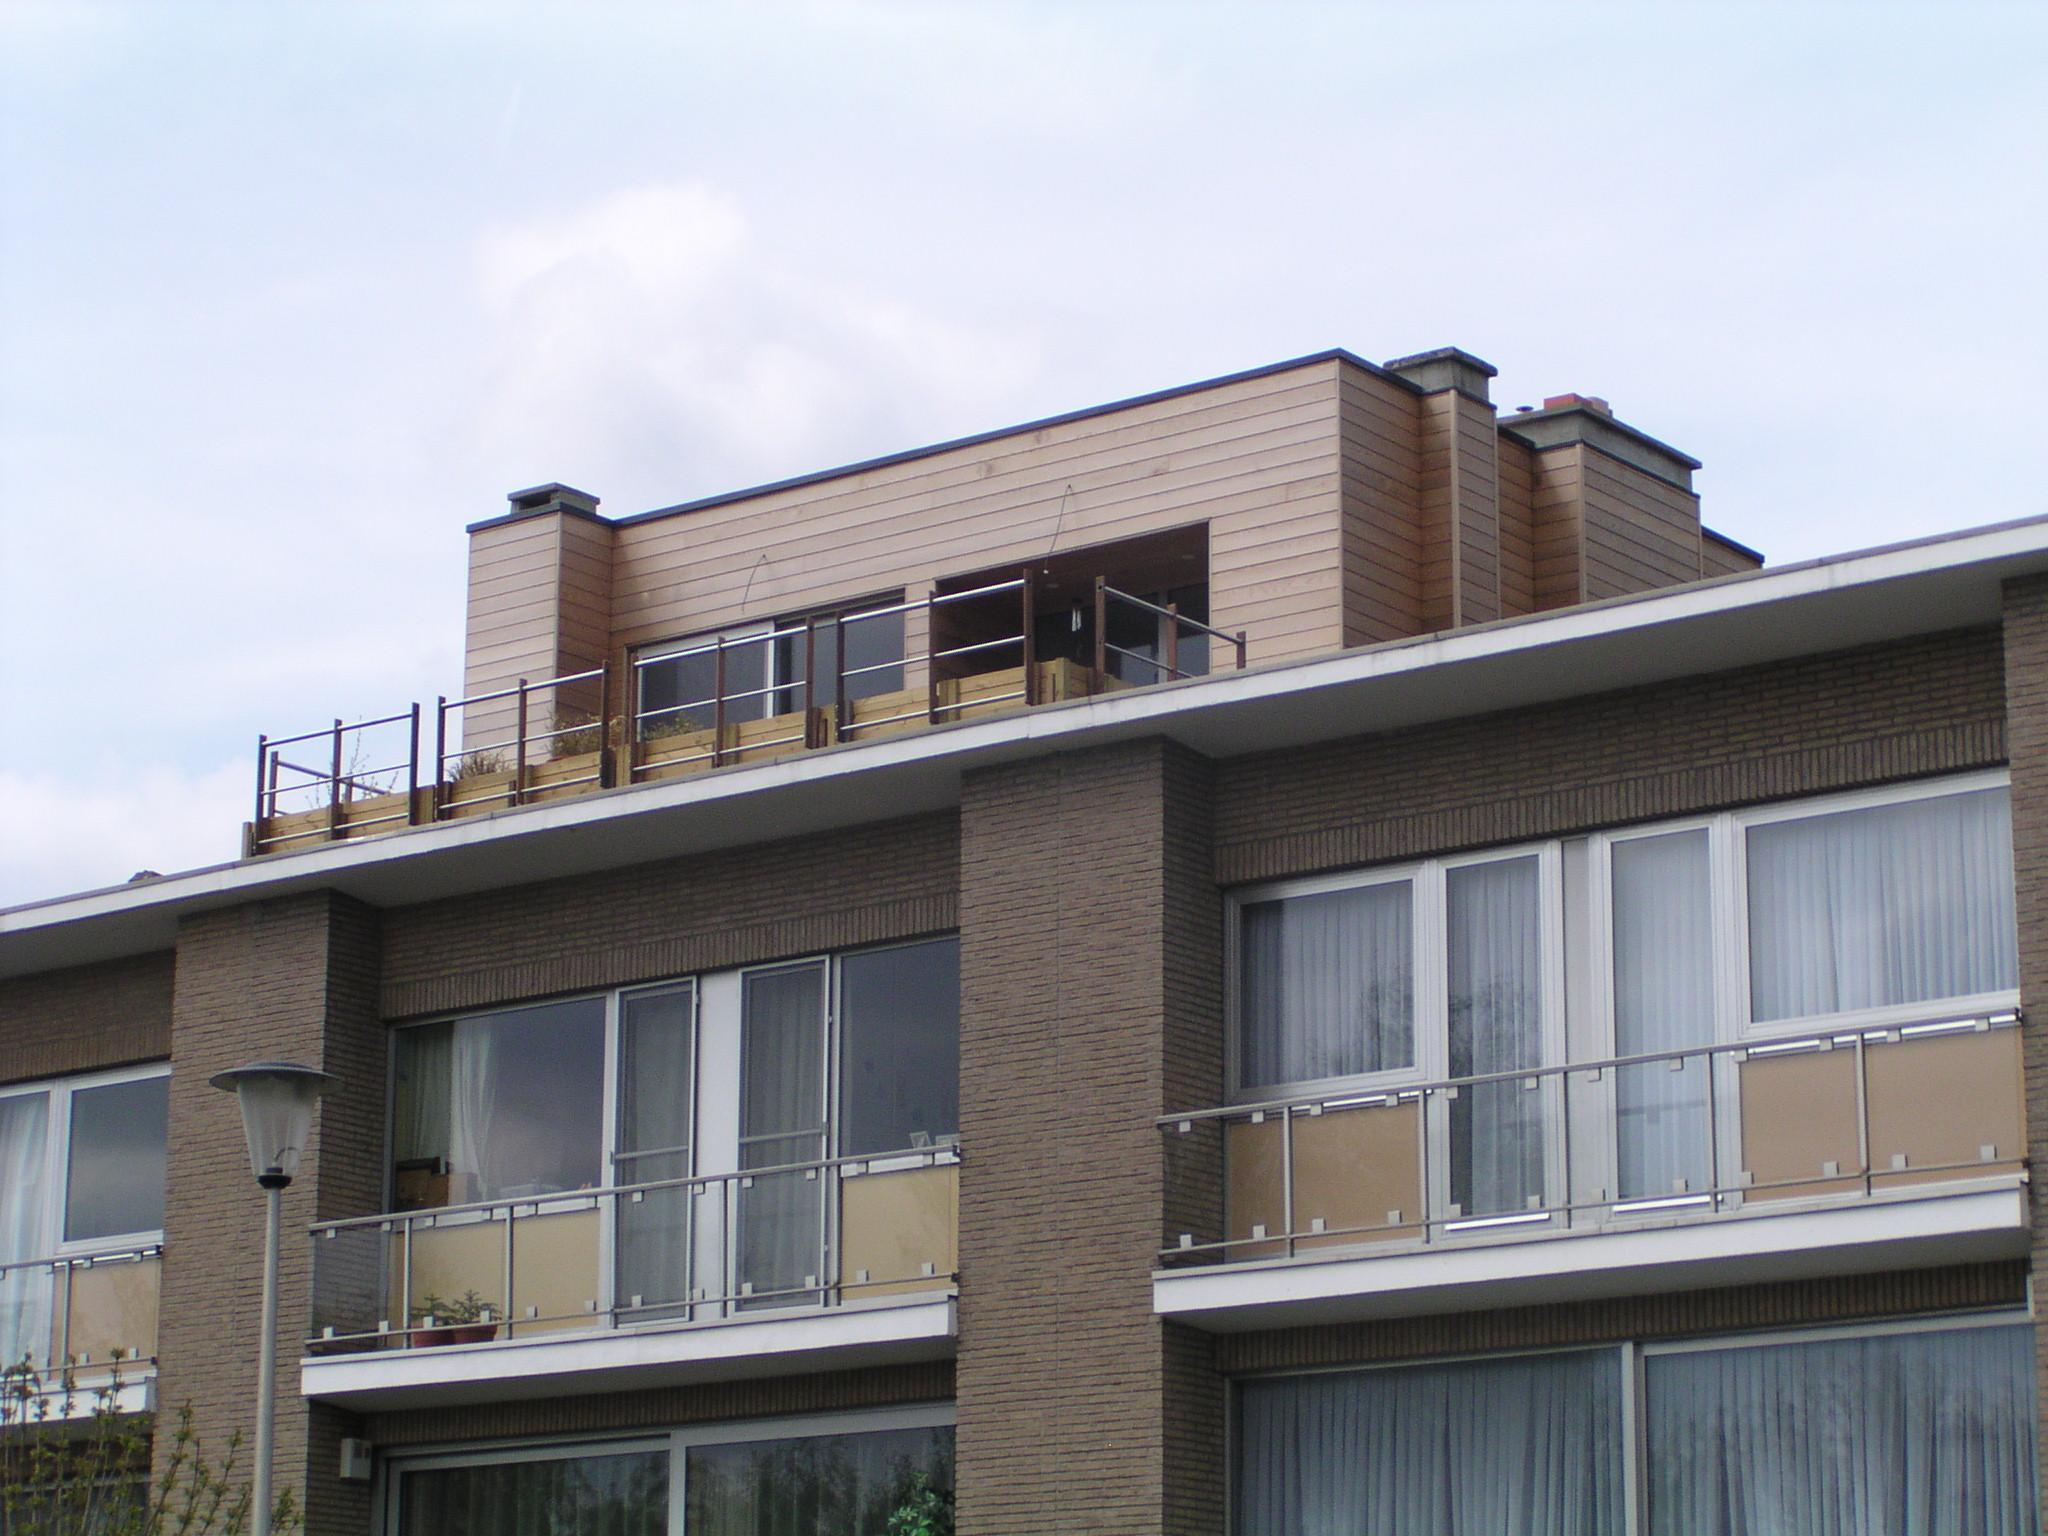 Ossature bois keppenne for Extension habitation